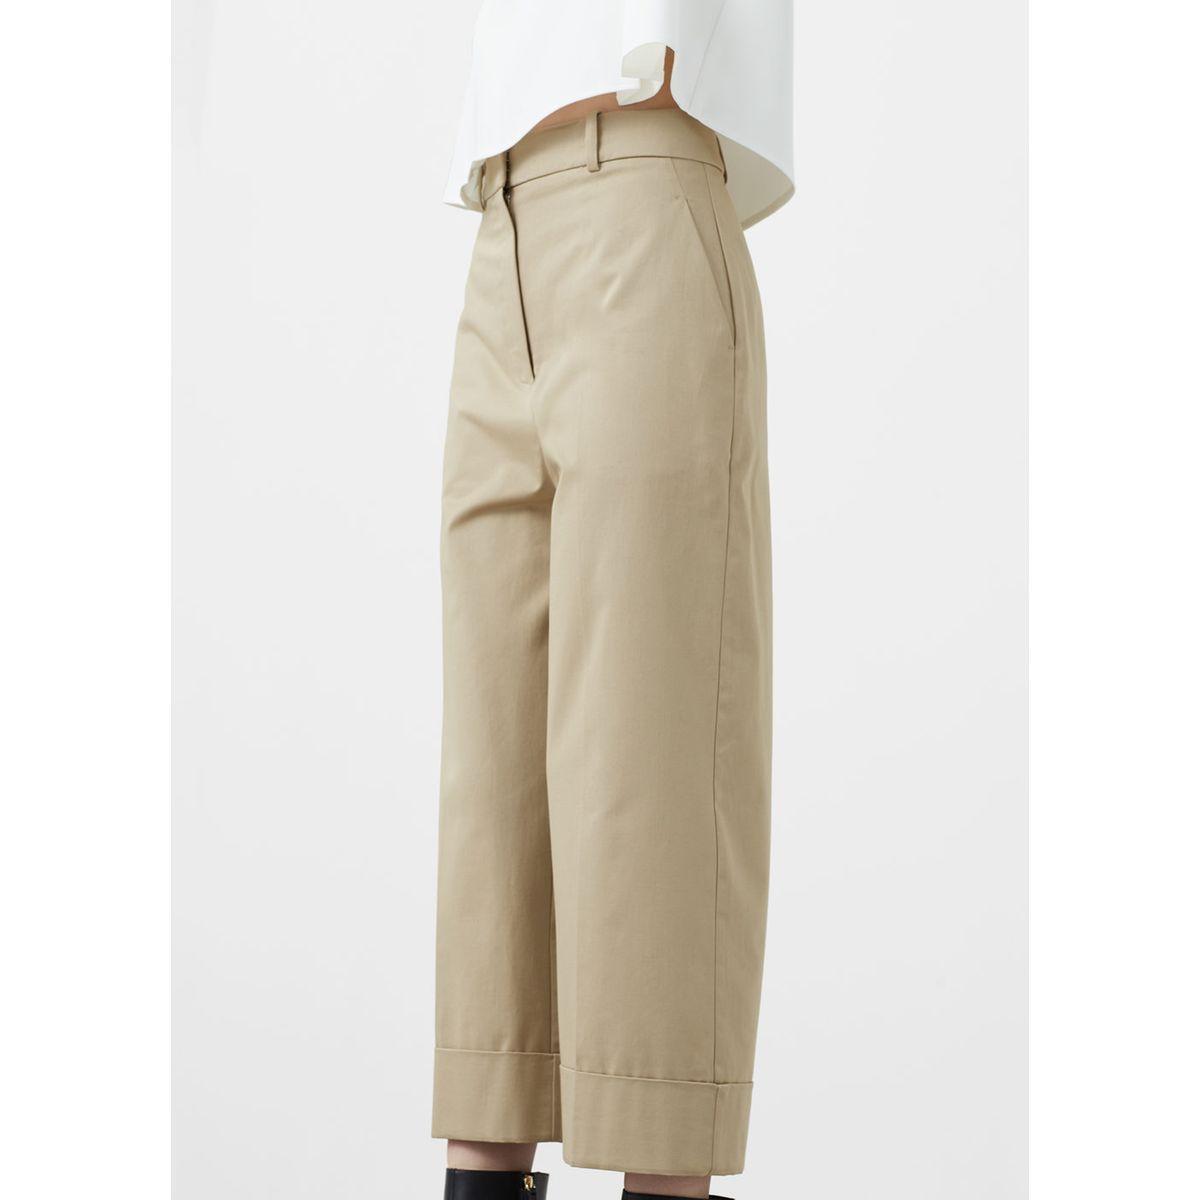 ae8c0e1c244ca Pantalon crop coton beige Mango   La Redoute   womenzzzwear ...